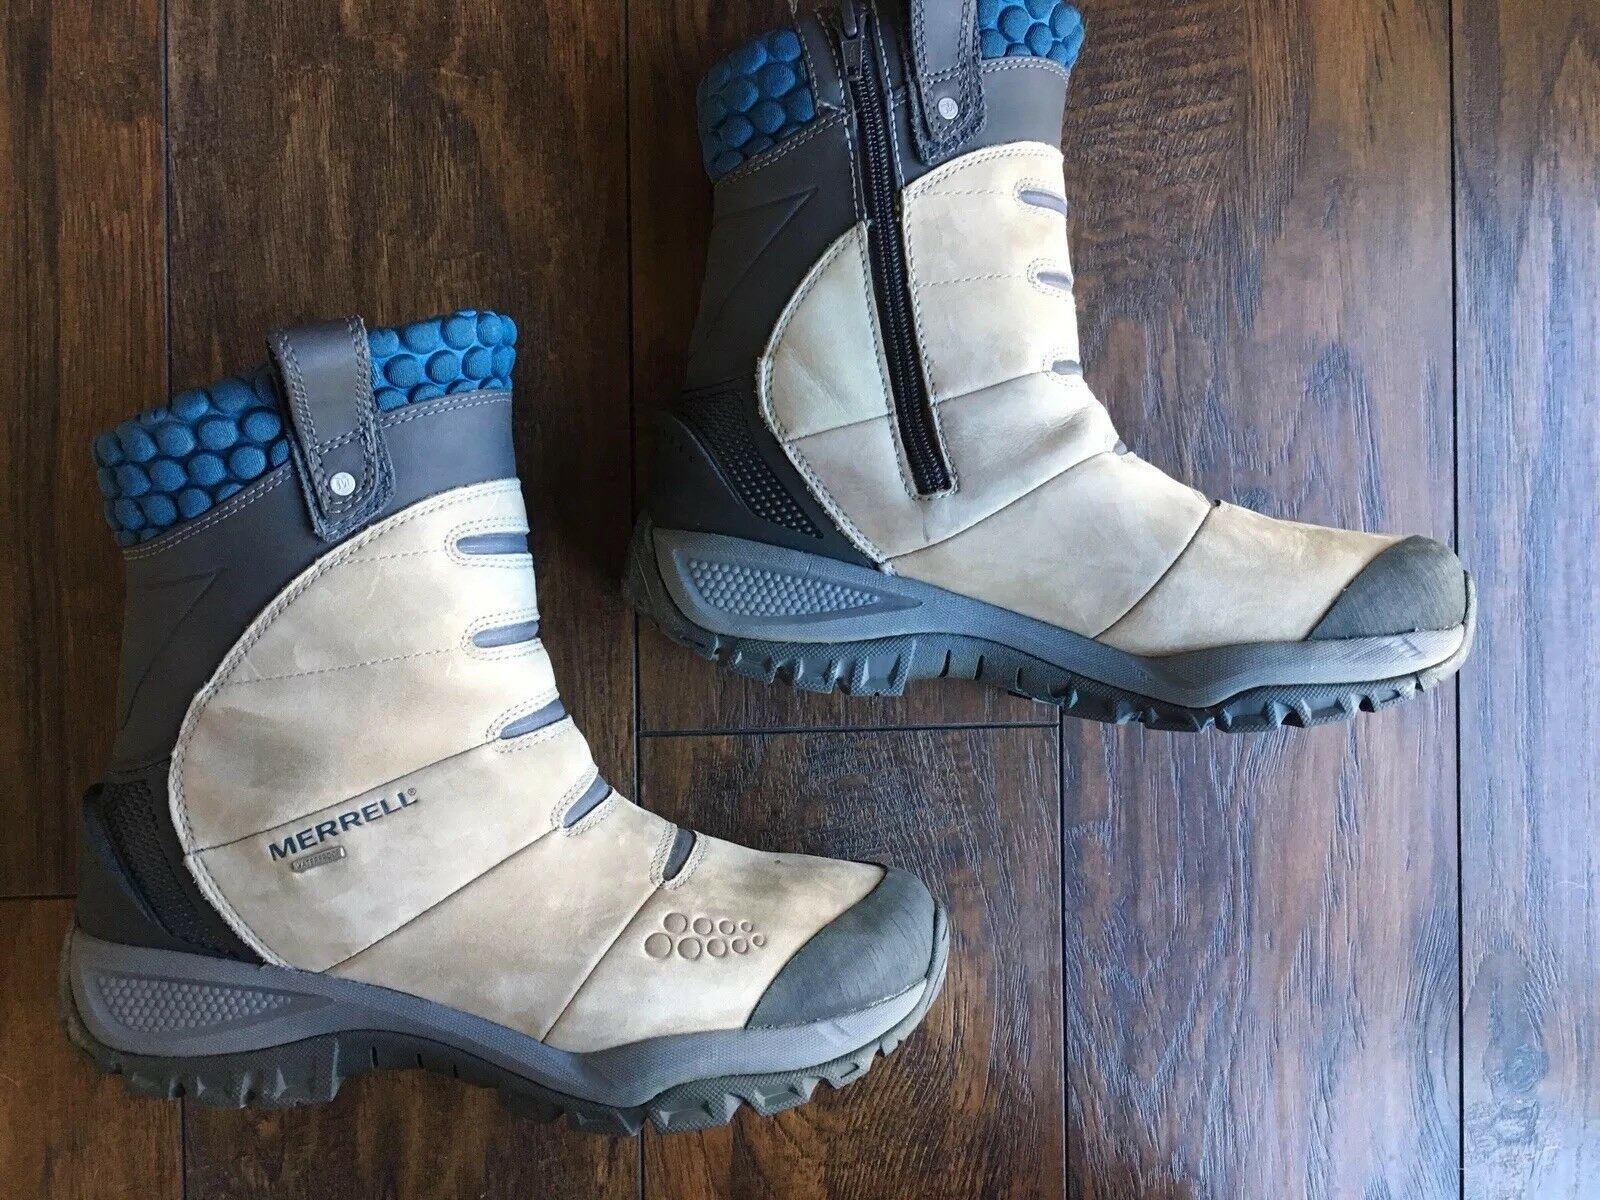 Merrell donna stivali 9   9.5 Artic Fox Smoke Pull On  Zipper Tan blu Snow scarpe